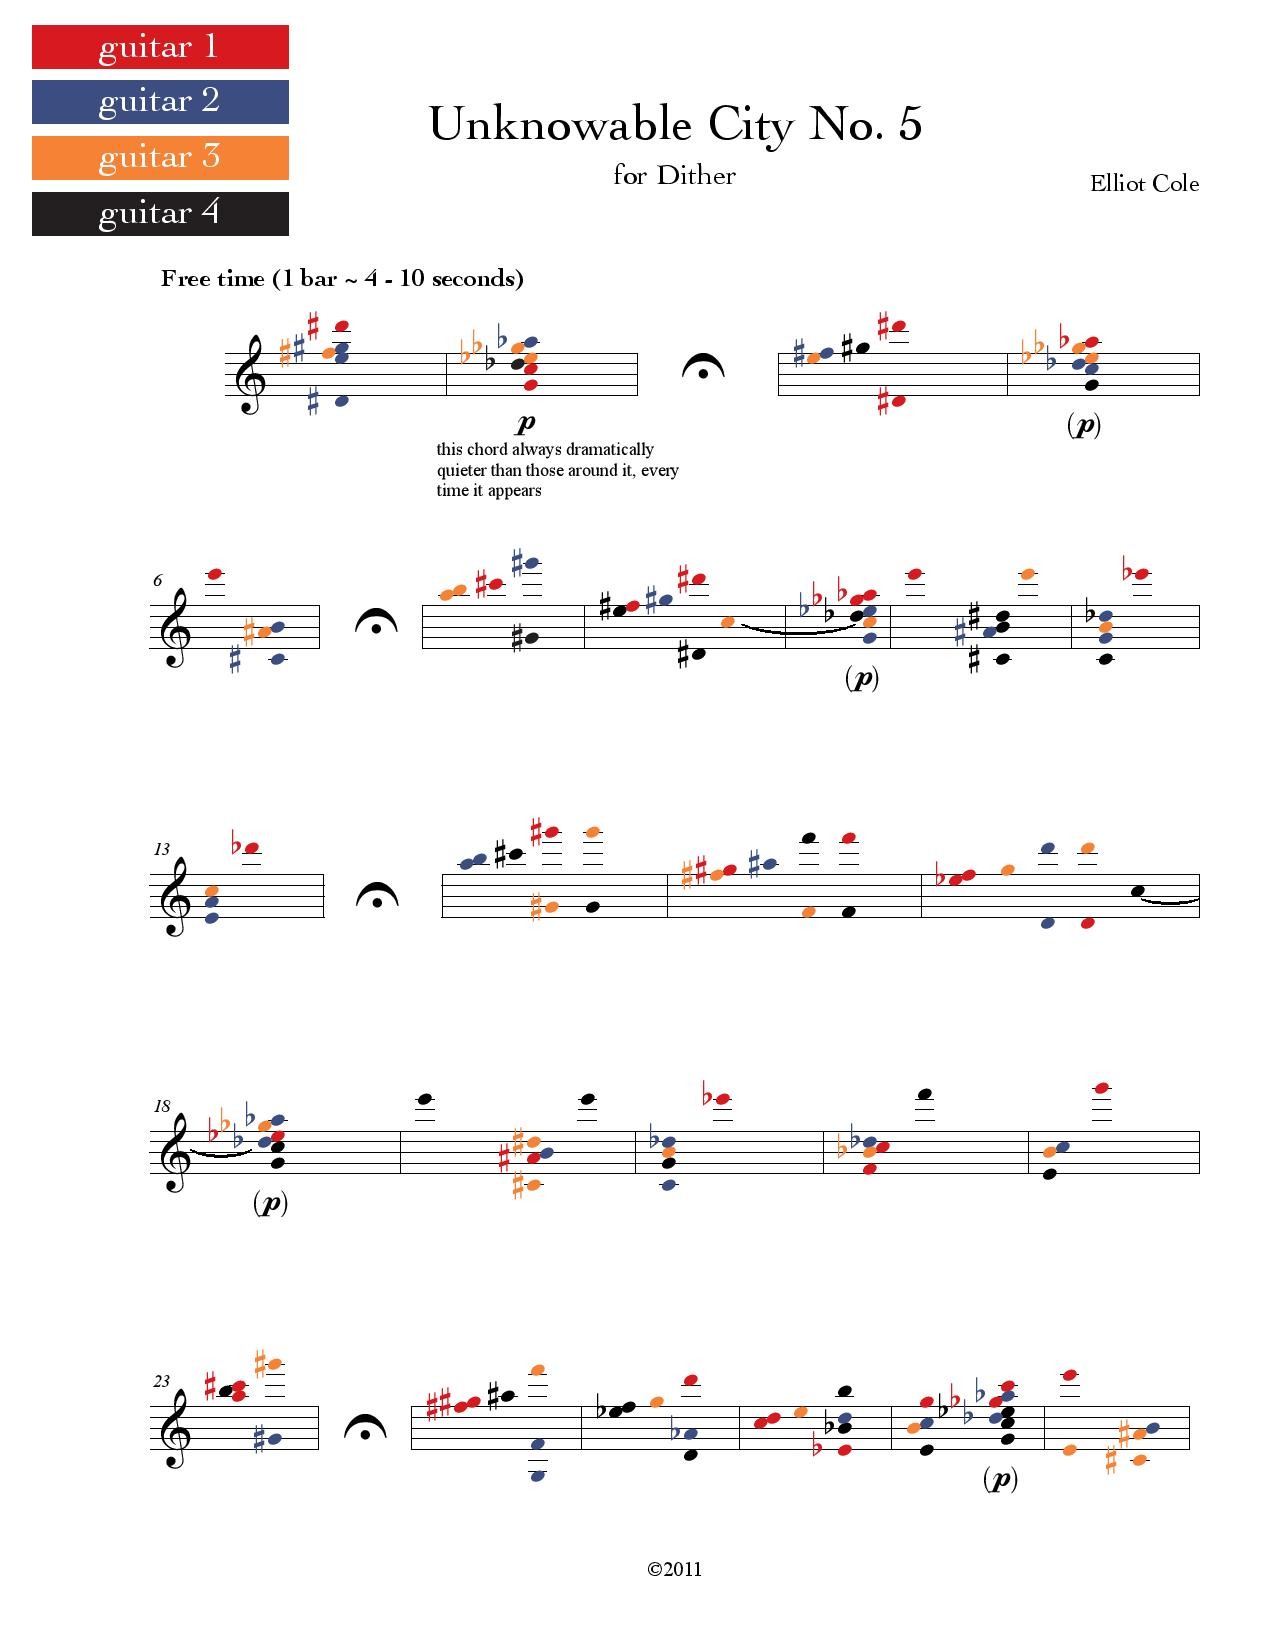 elliotcole-uc5-page-003.jpg